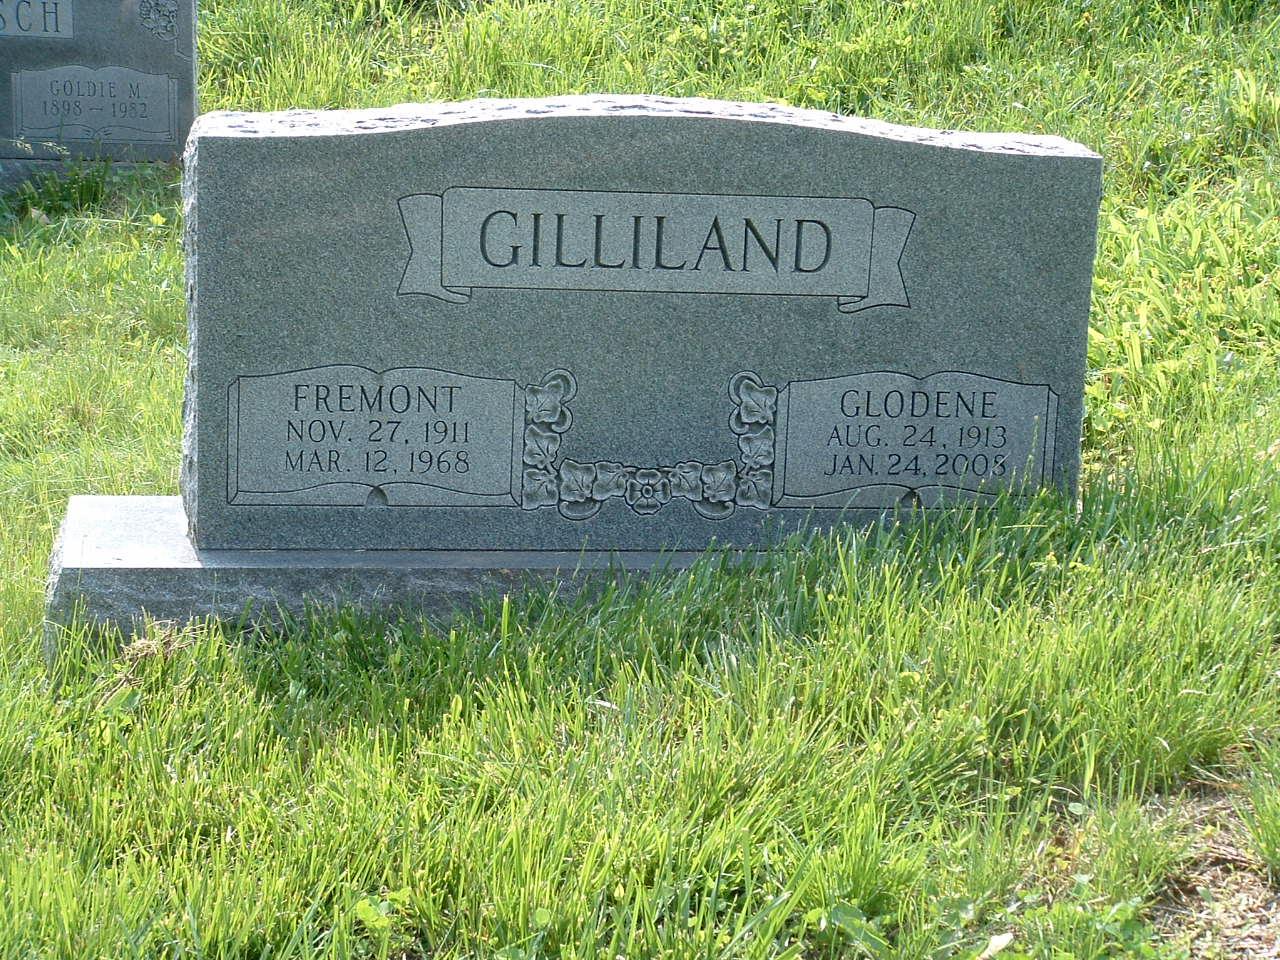 Clifton Fremont Gilliland